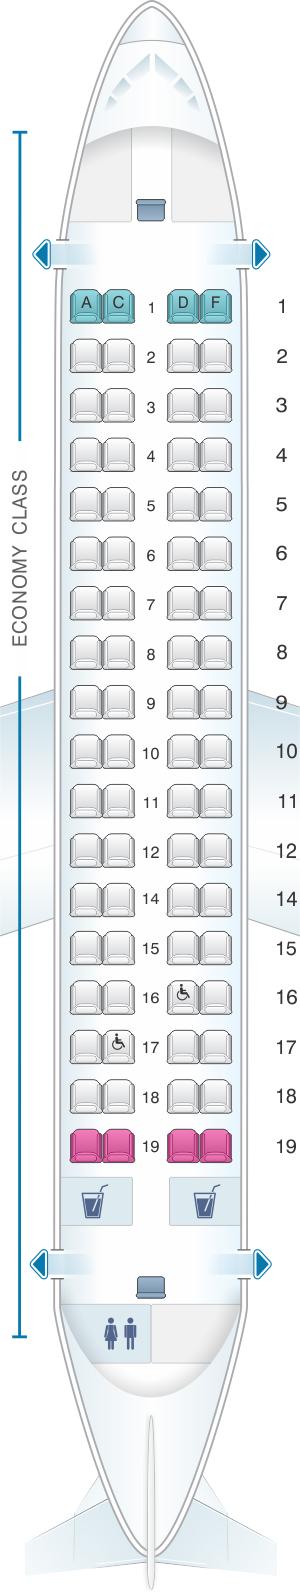 Seat map for Jet Airways ATR 72 500 72PAX